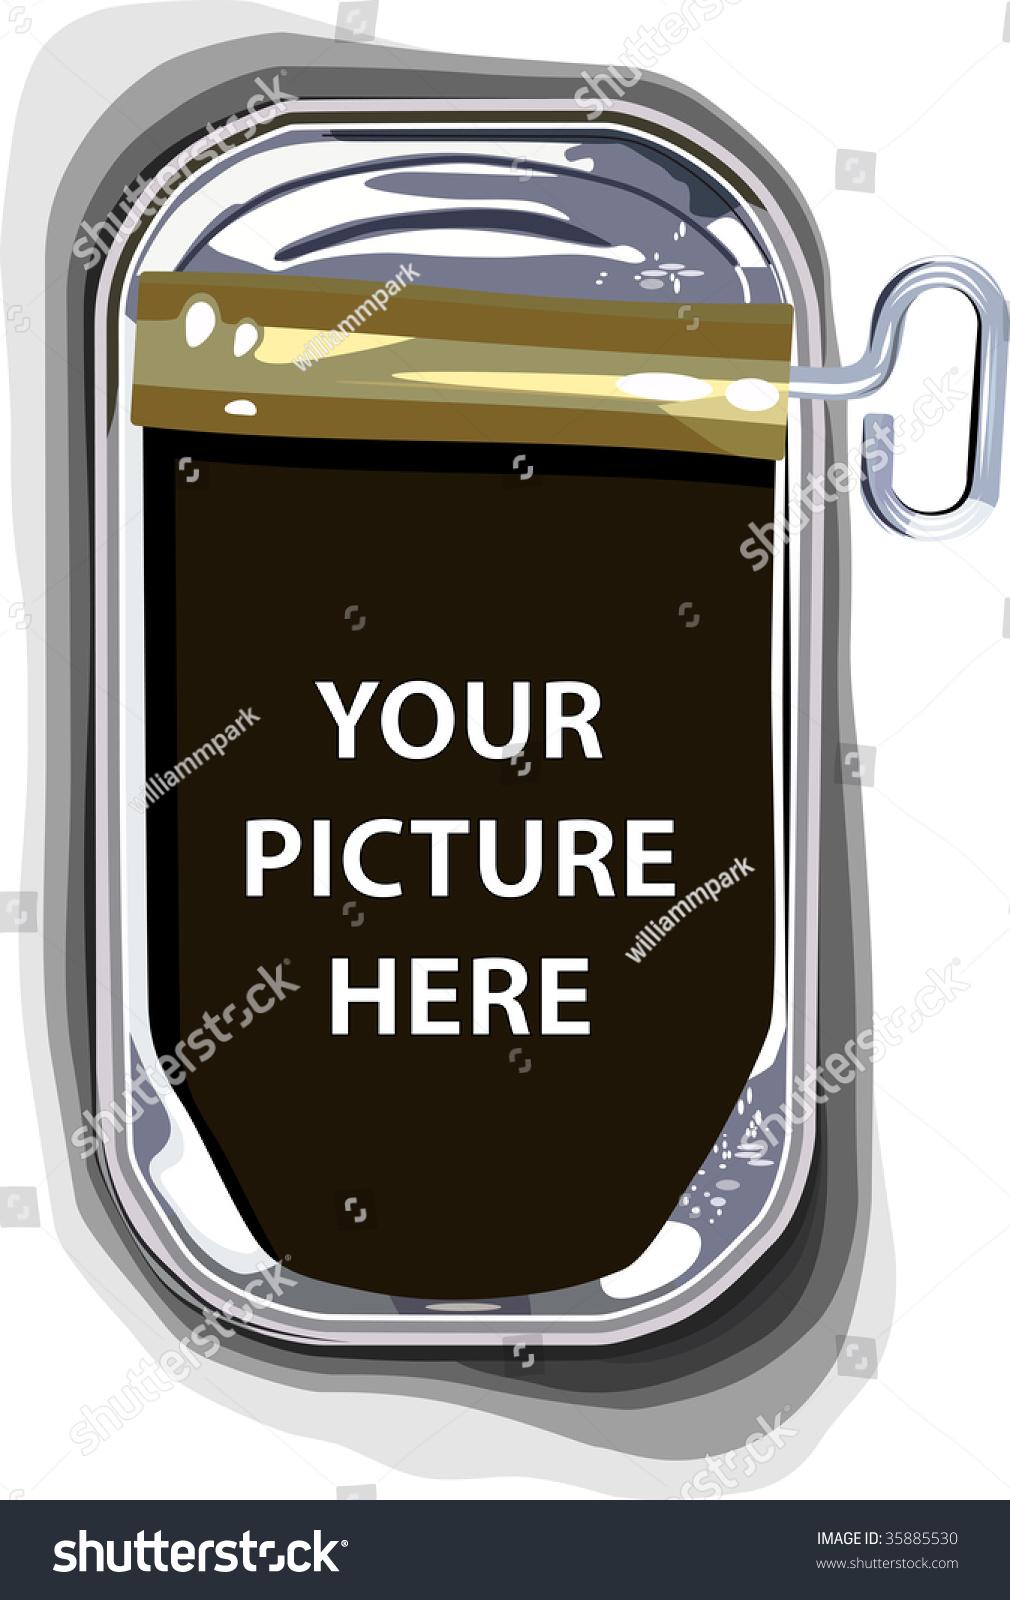 Empty sardine tin can stock vector illustration 35885530 Empty sardine cans